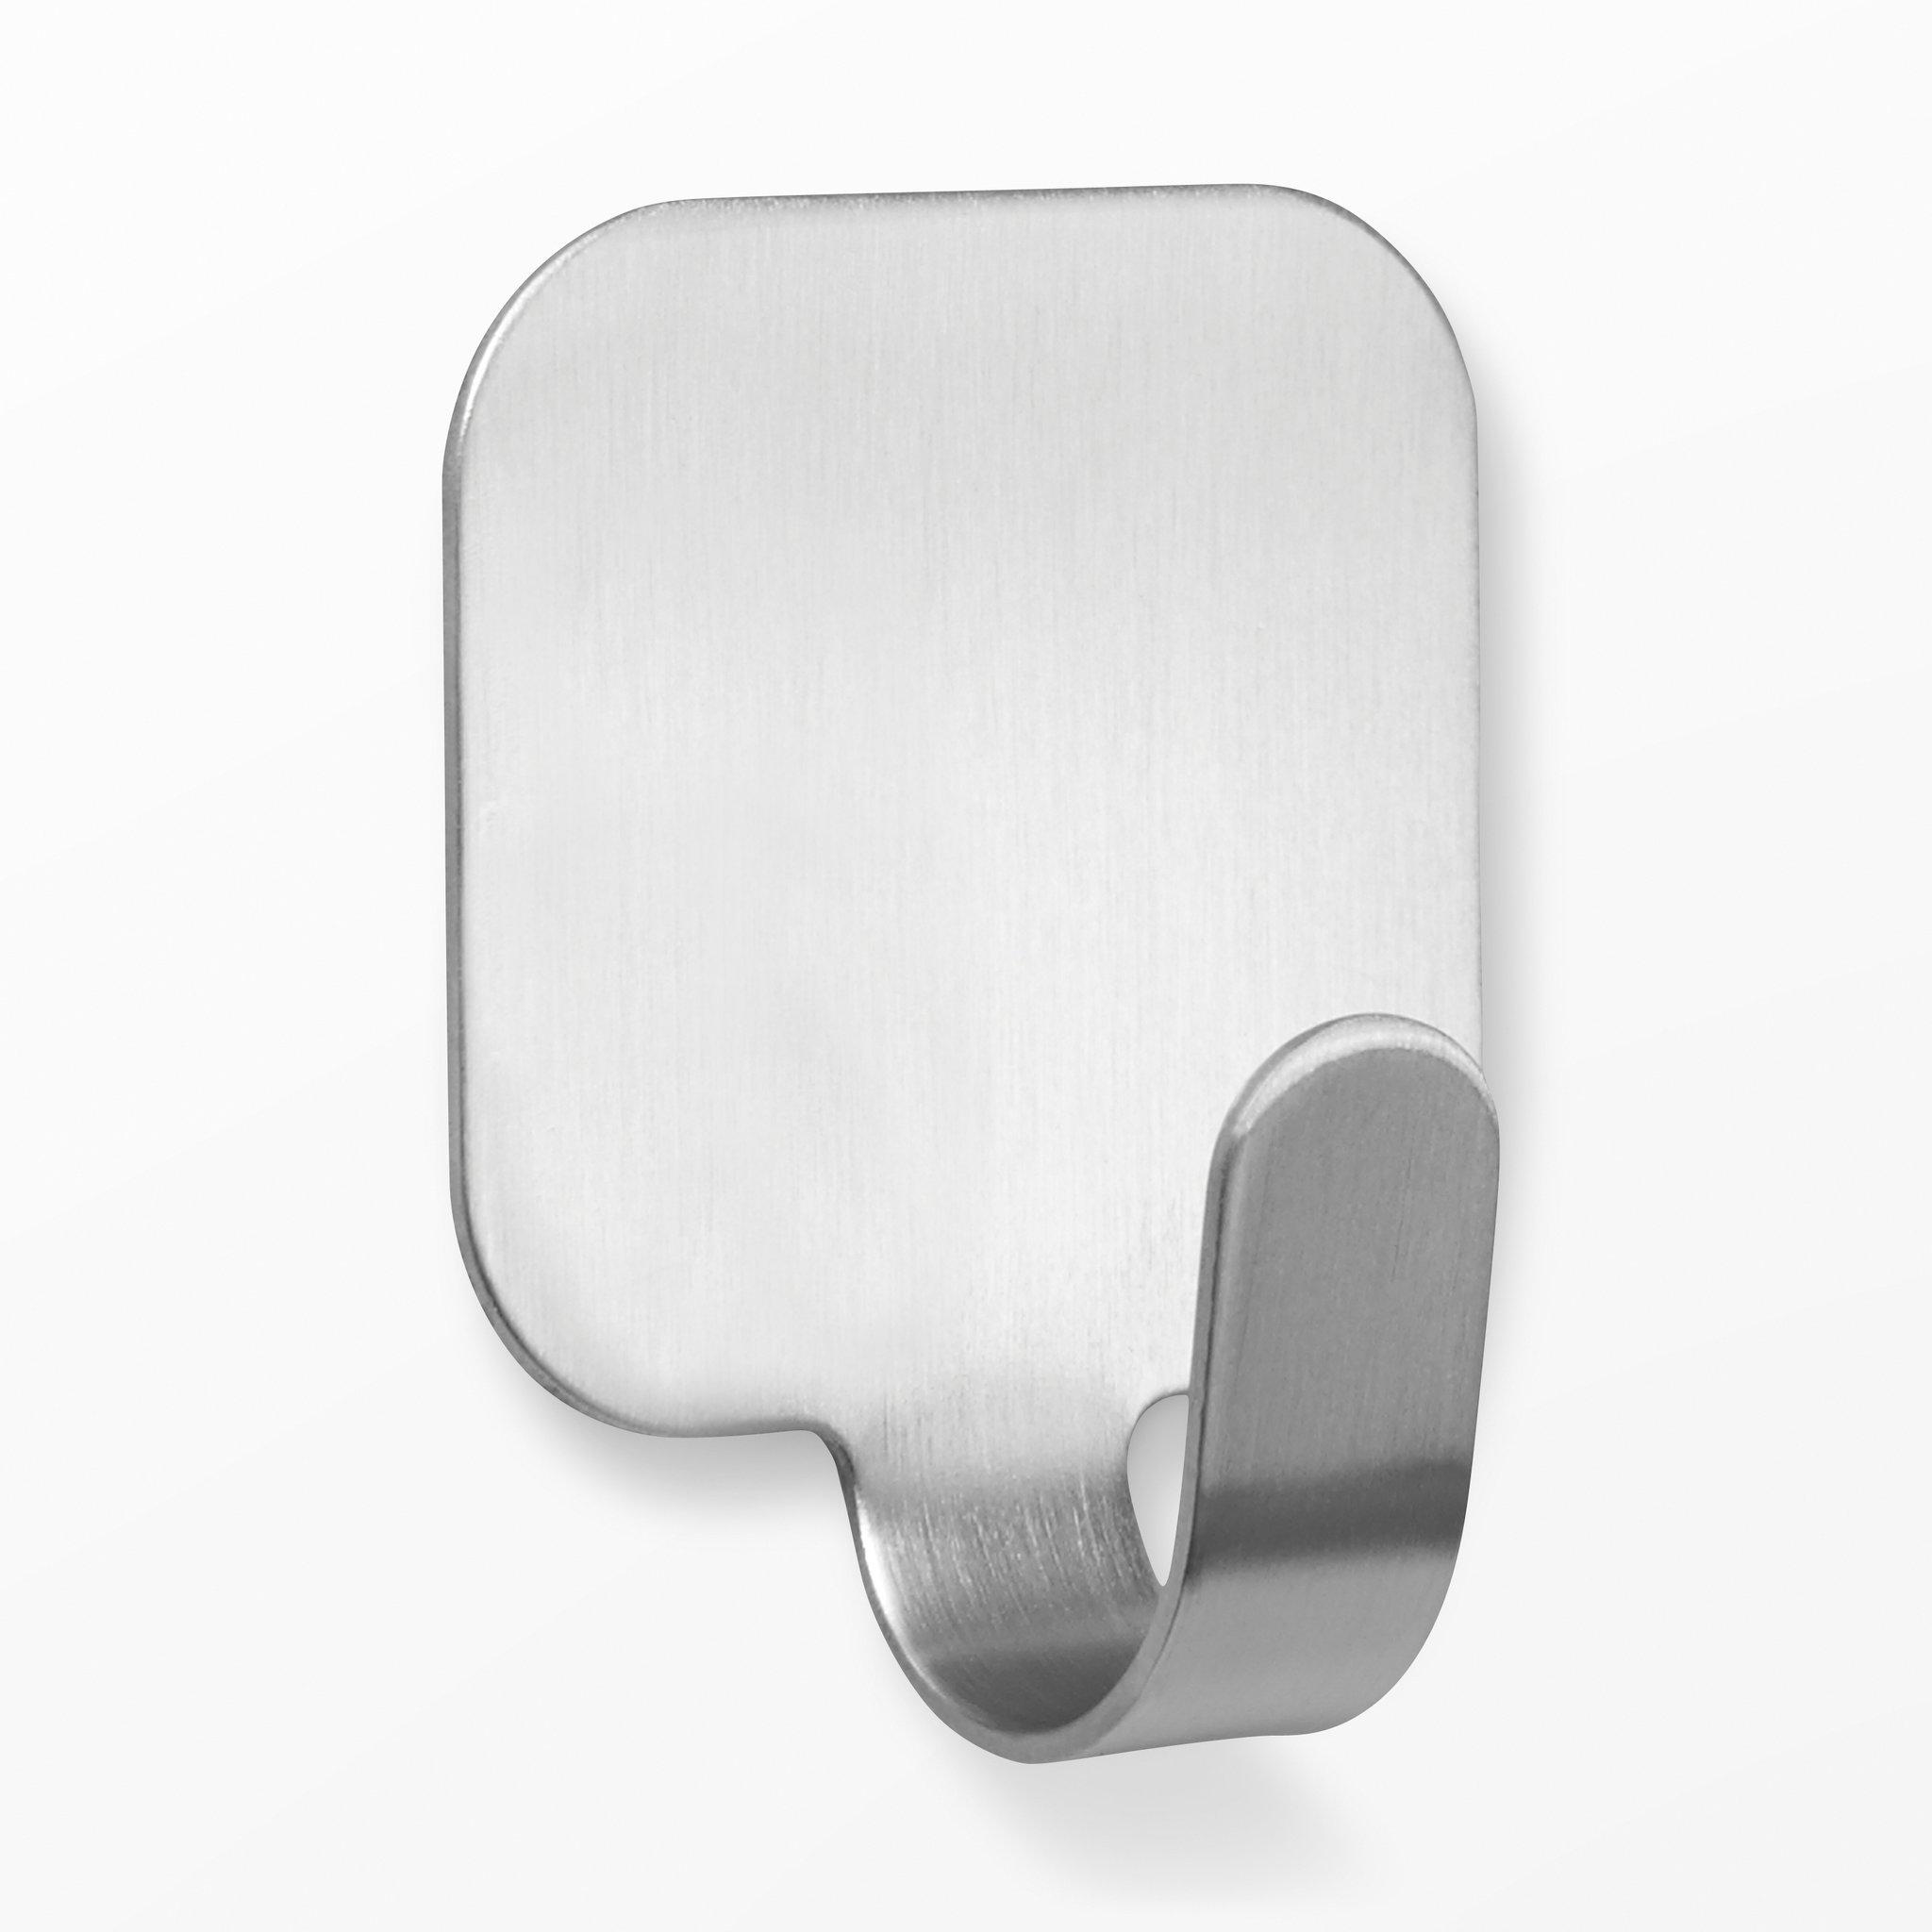 Självhäftande krok Kvarnsjön, 3x3,7 cm